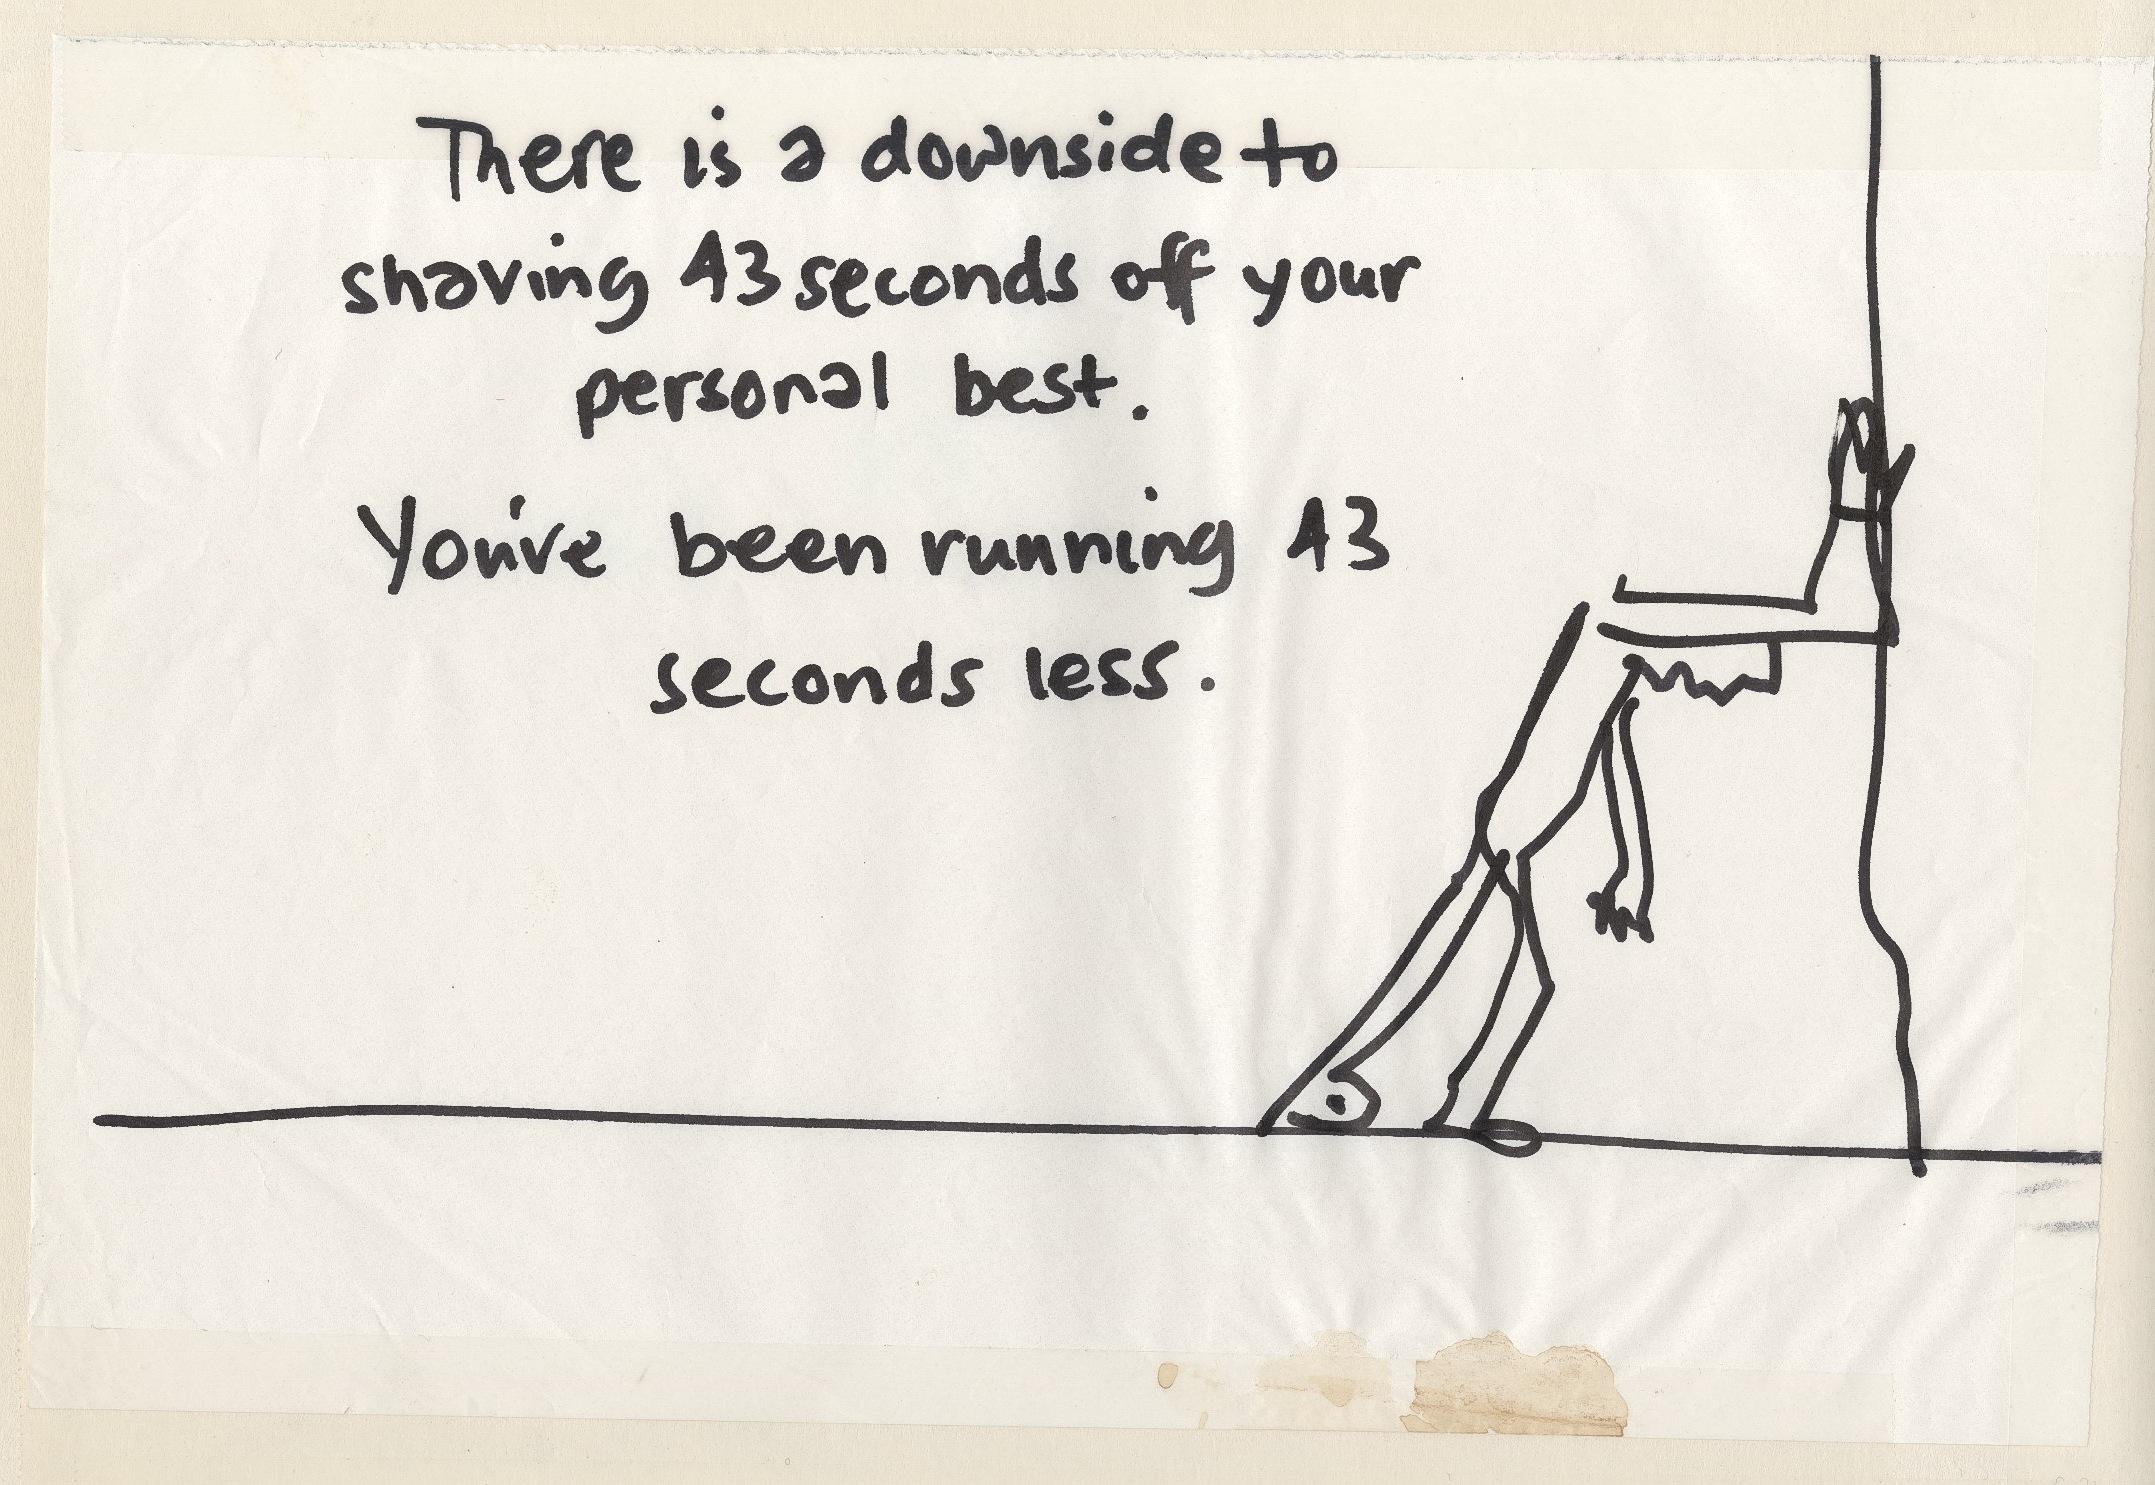 Adidas - Running, Rough,  %22Downside...%22